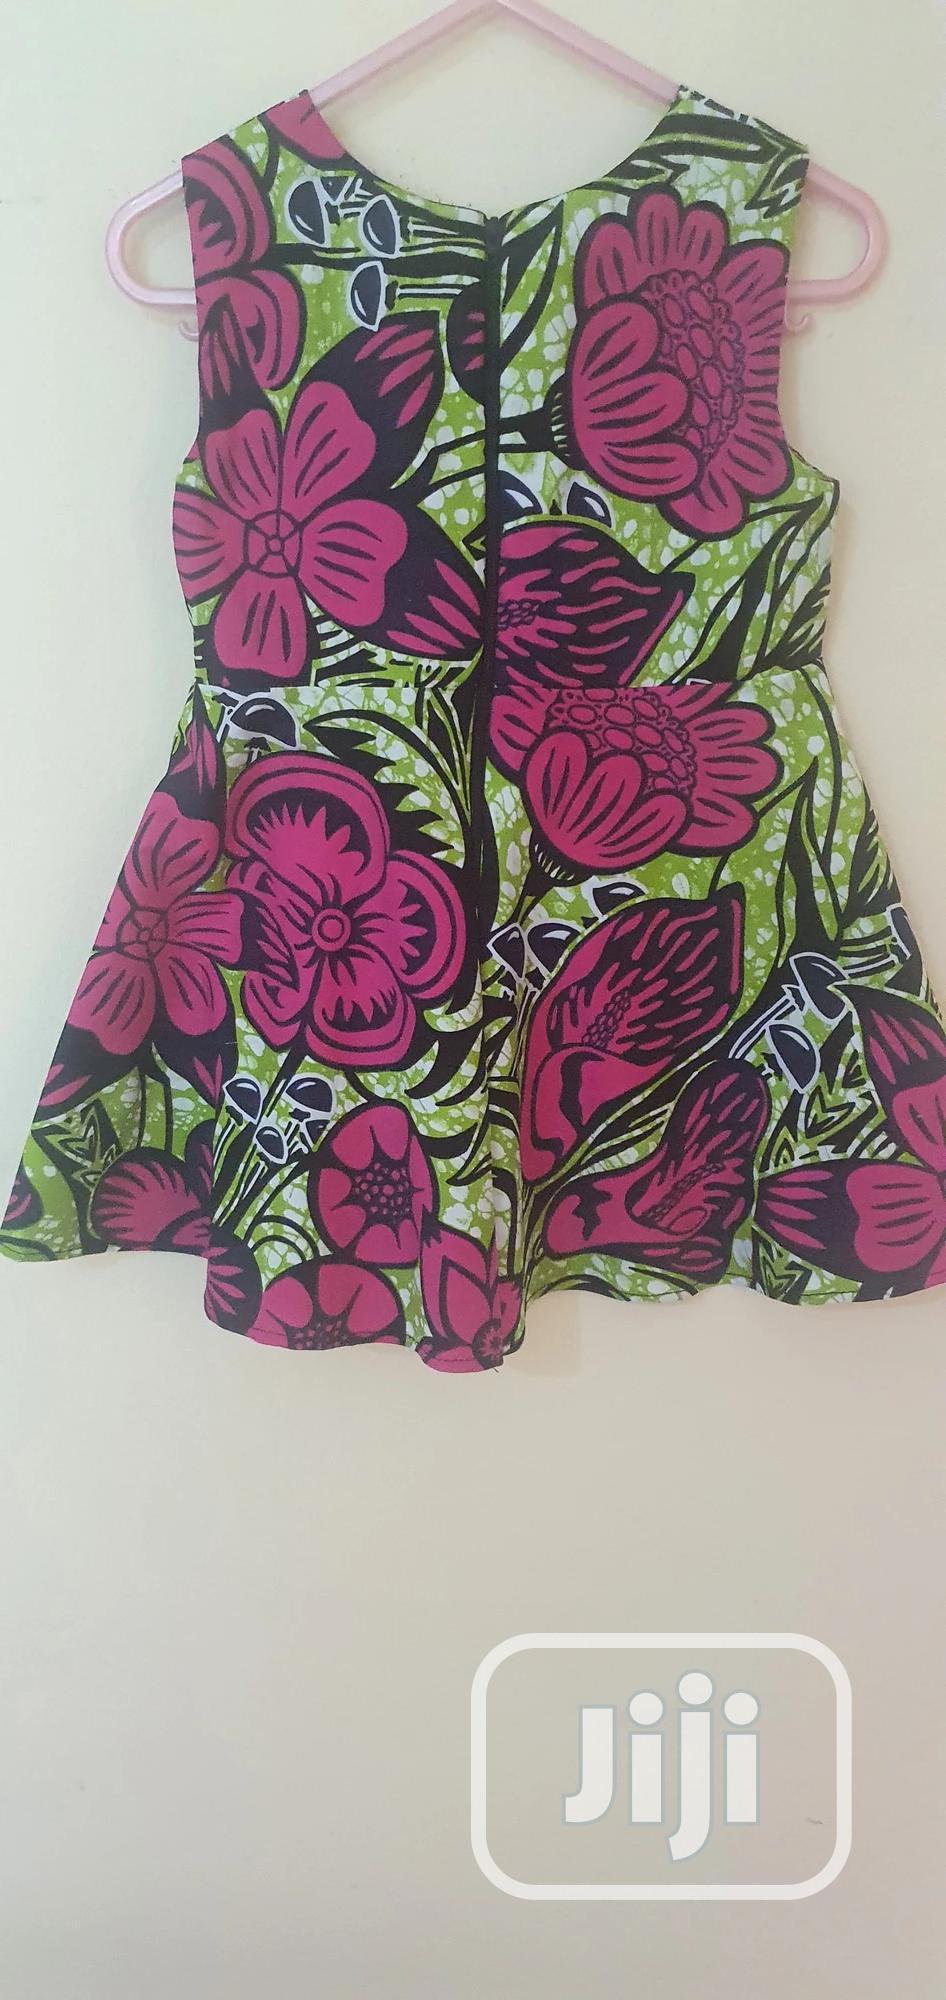 Girls' Sleeveless Floral Ankara Dress   Children's Clothing for sale in Lekki, Lagos State, Nigeria